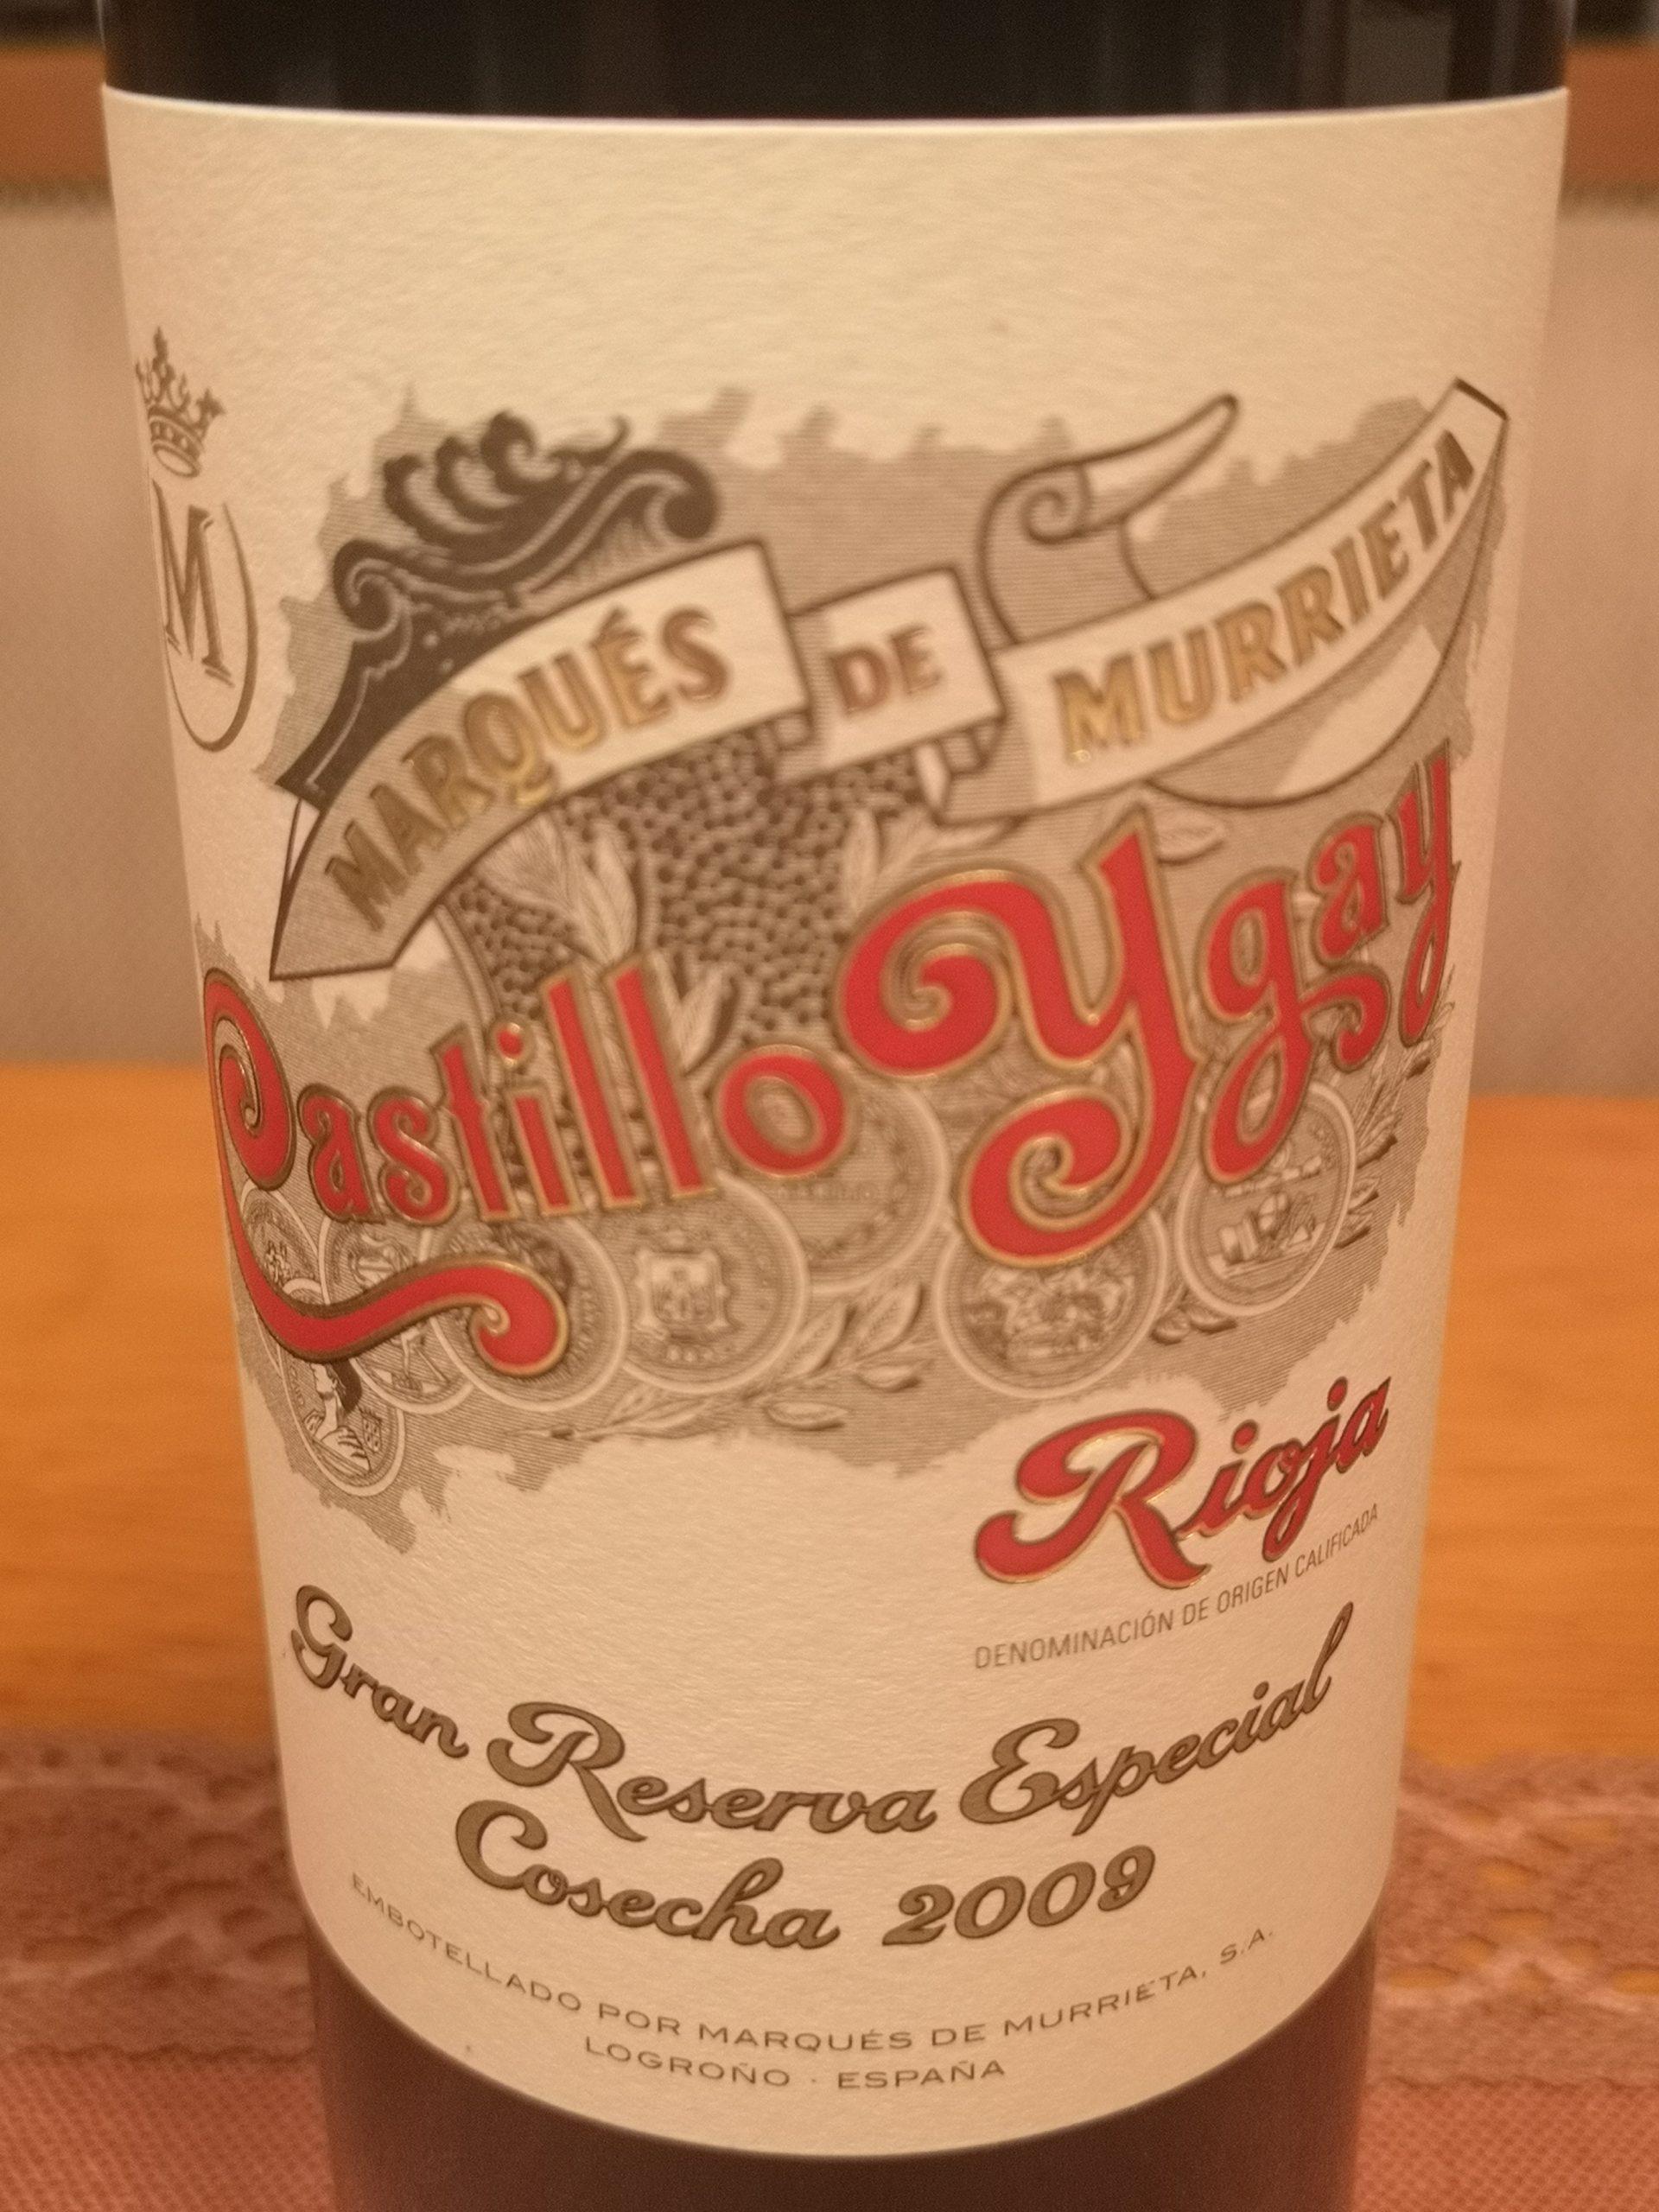 2009 Castillo Ygay Gran Reserva Especial | Marqués de Murrieta